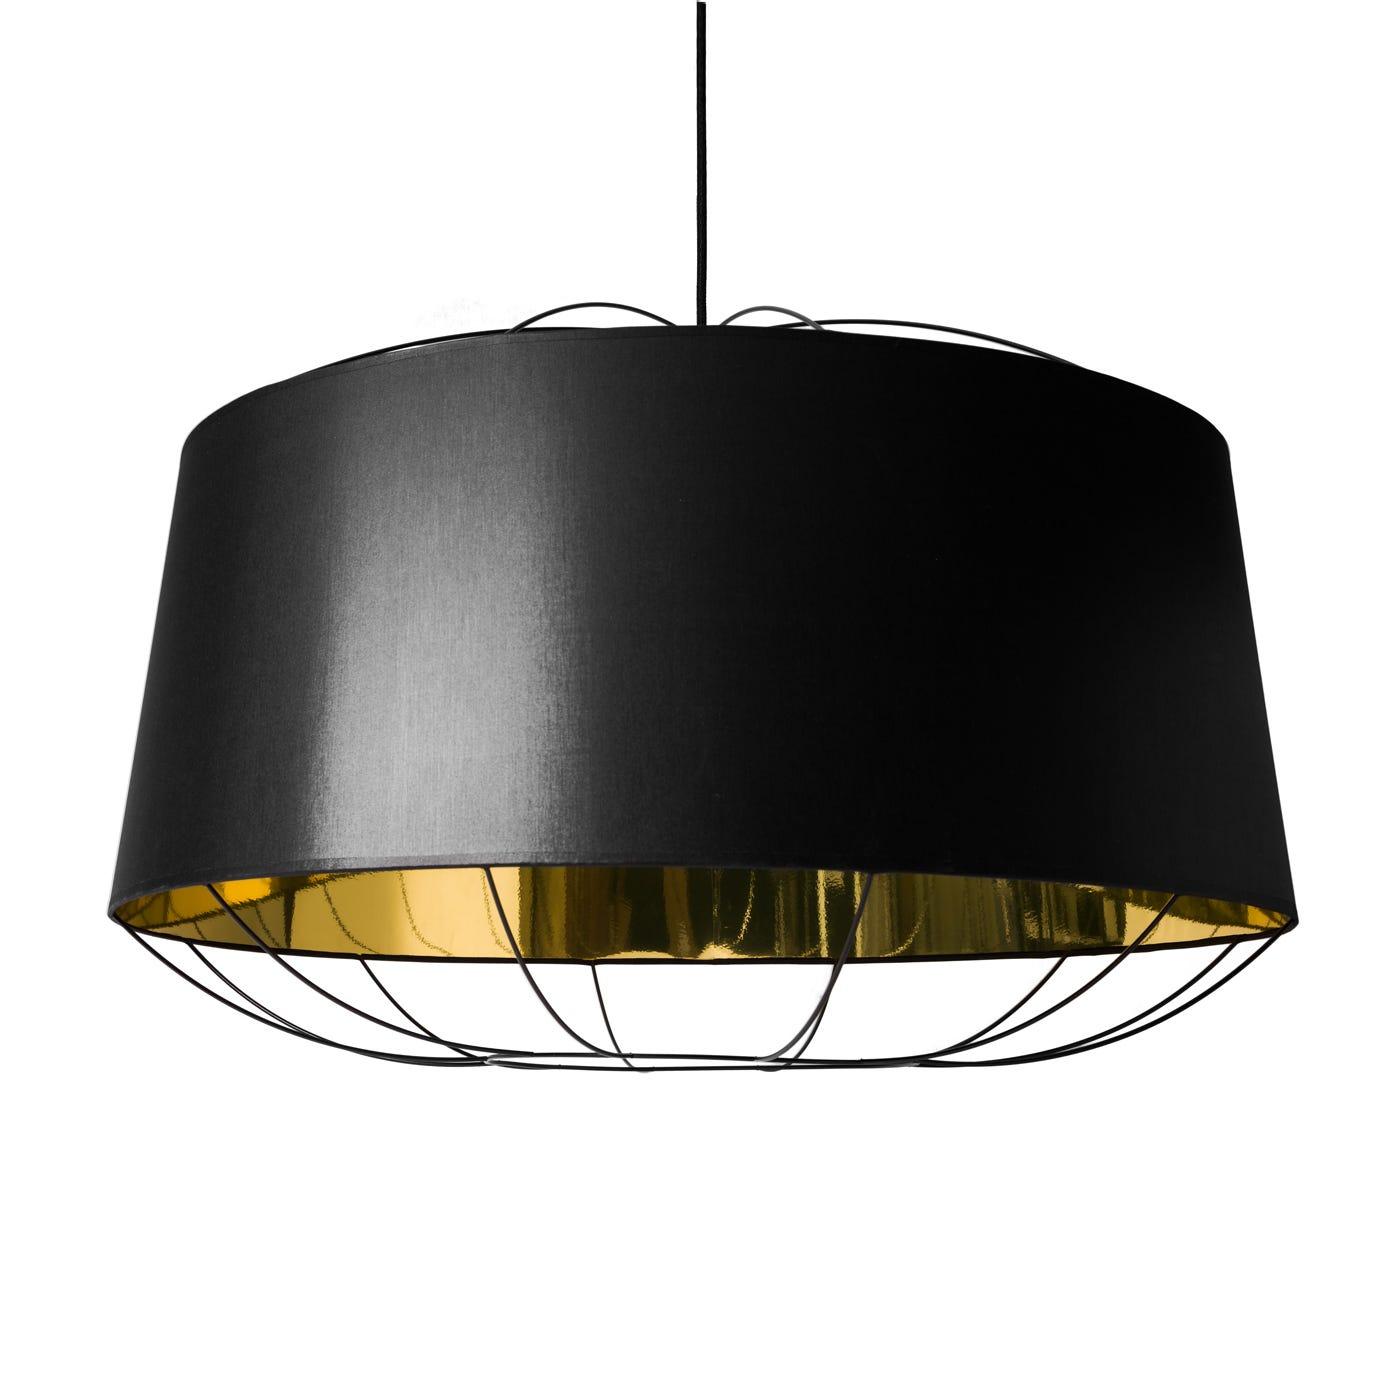 Lanterna Pendant Lamp Black and Gold